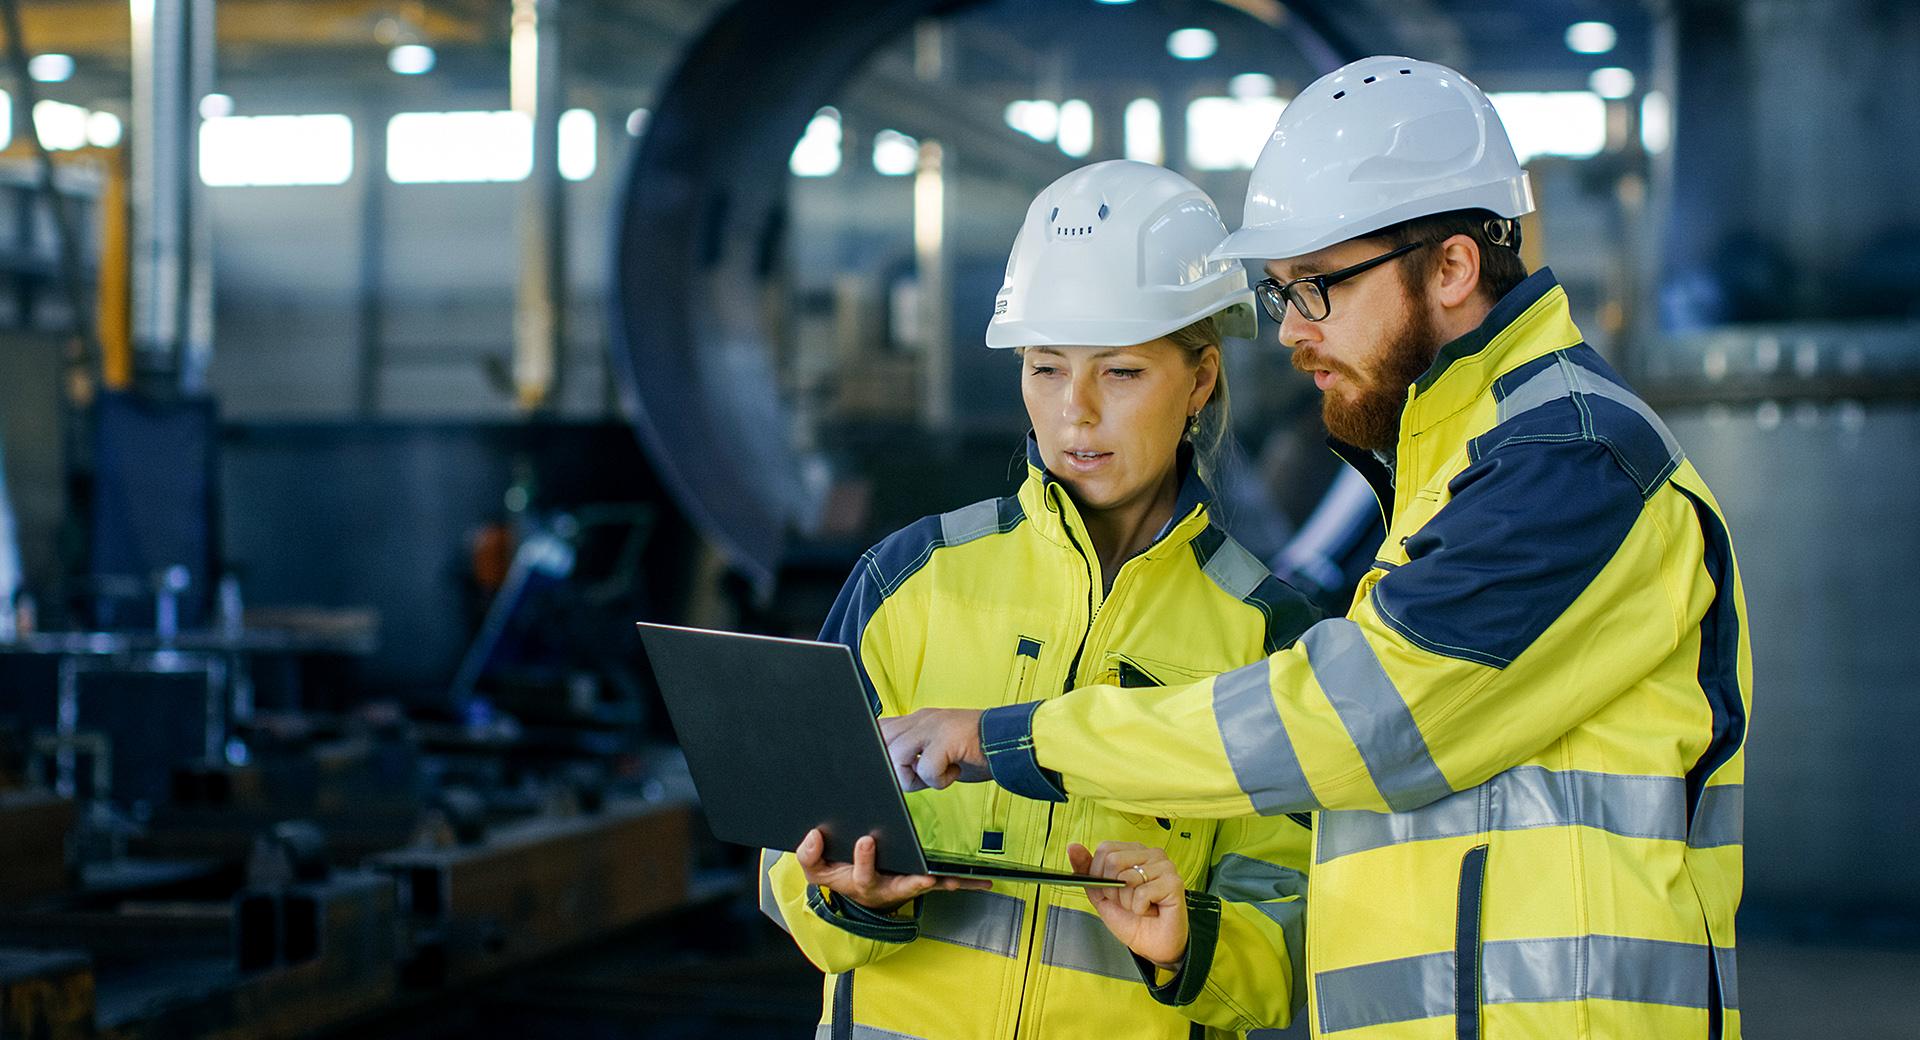 Compliance Days 2021 digital – Compliance Experience: Digitaler Arbeitsschutz bei der NKM Noell Special Cranes GmbH